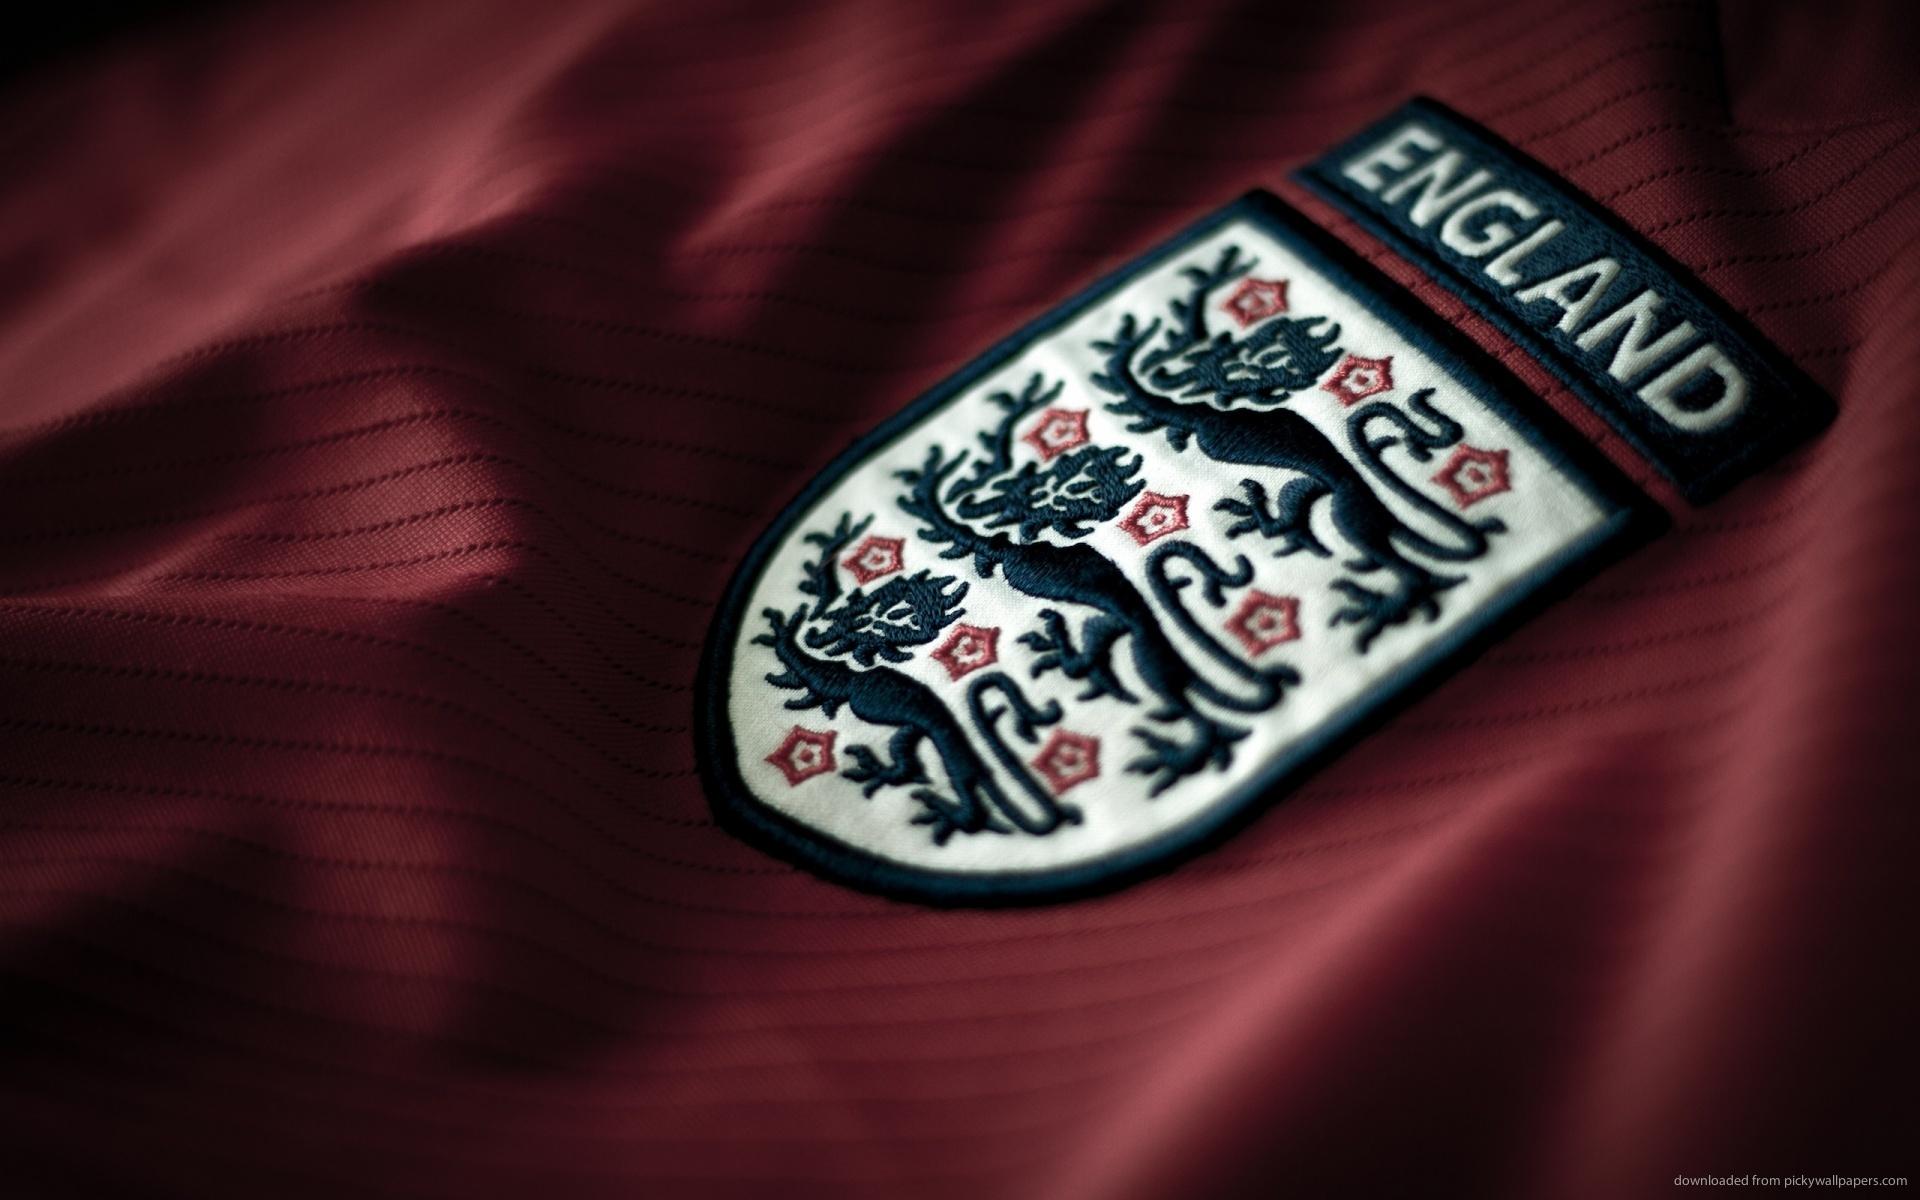 England Football Team logos pix